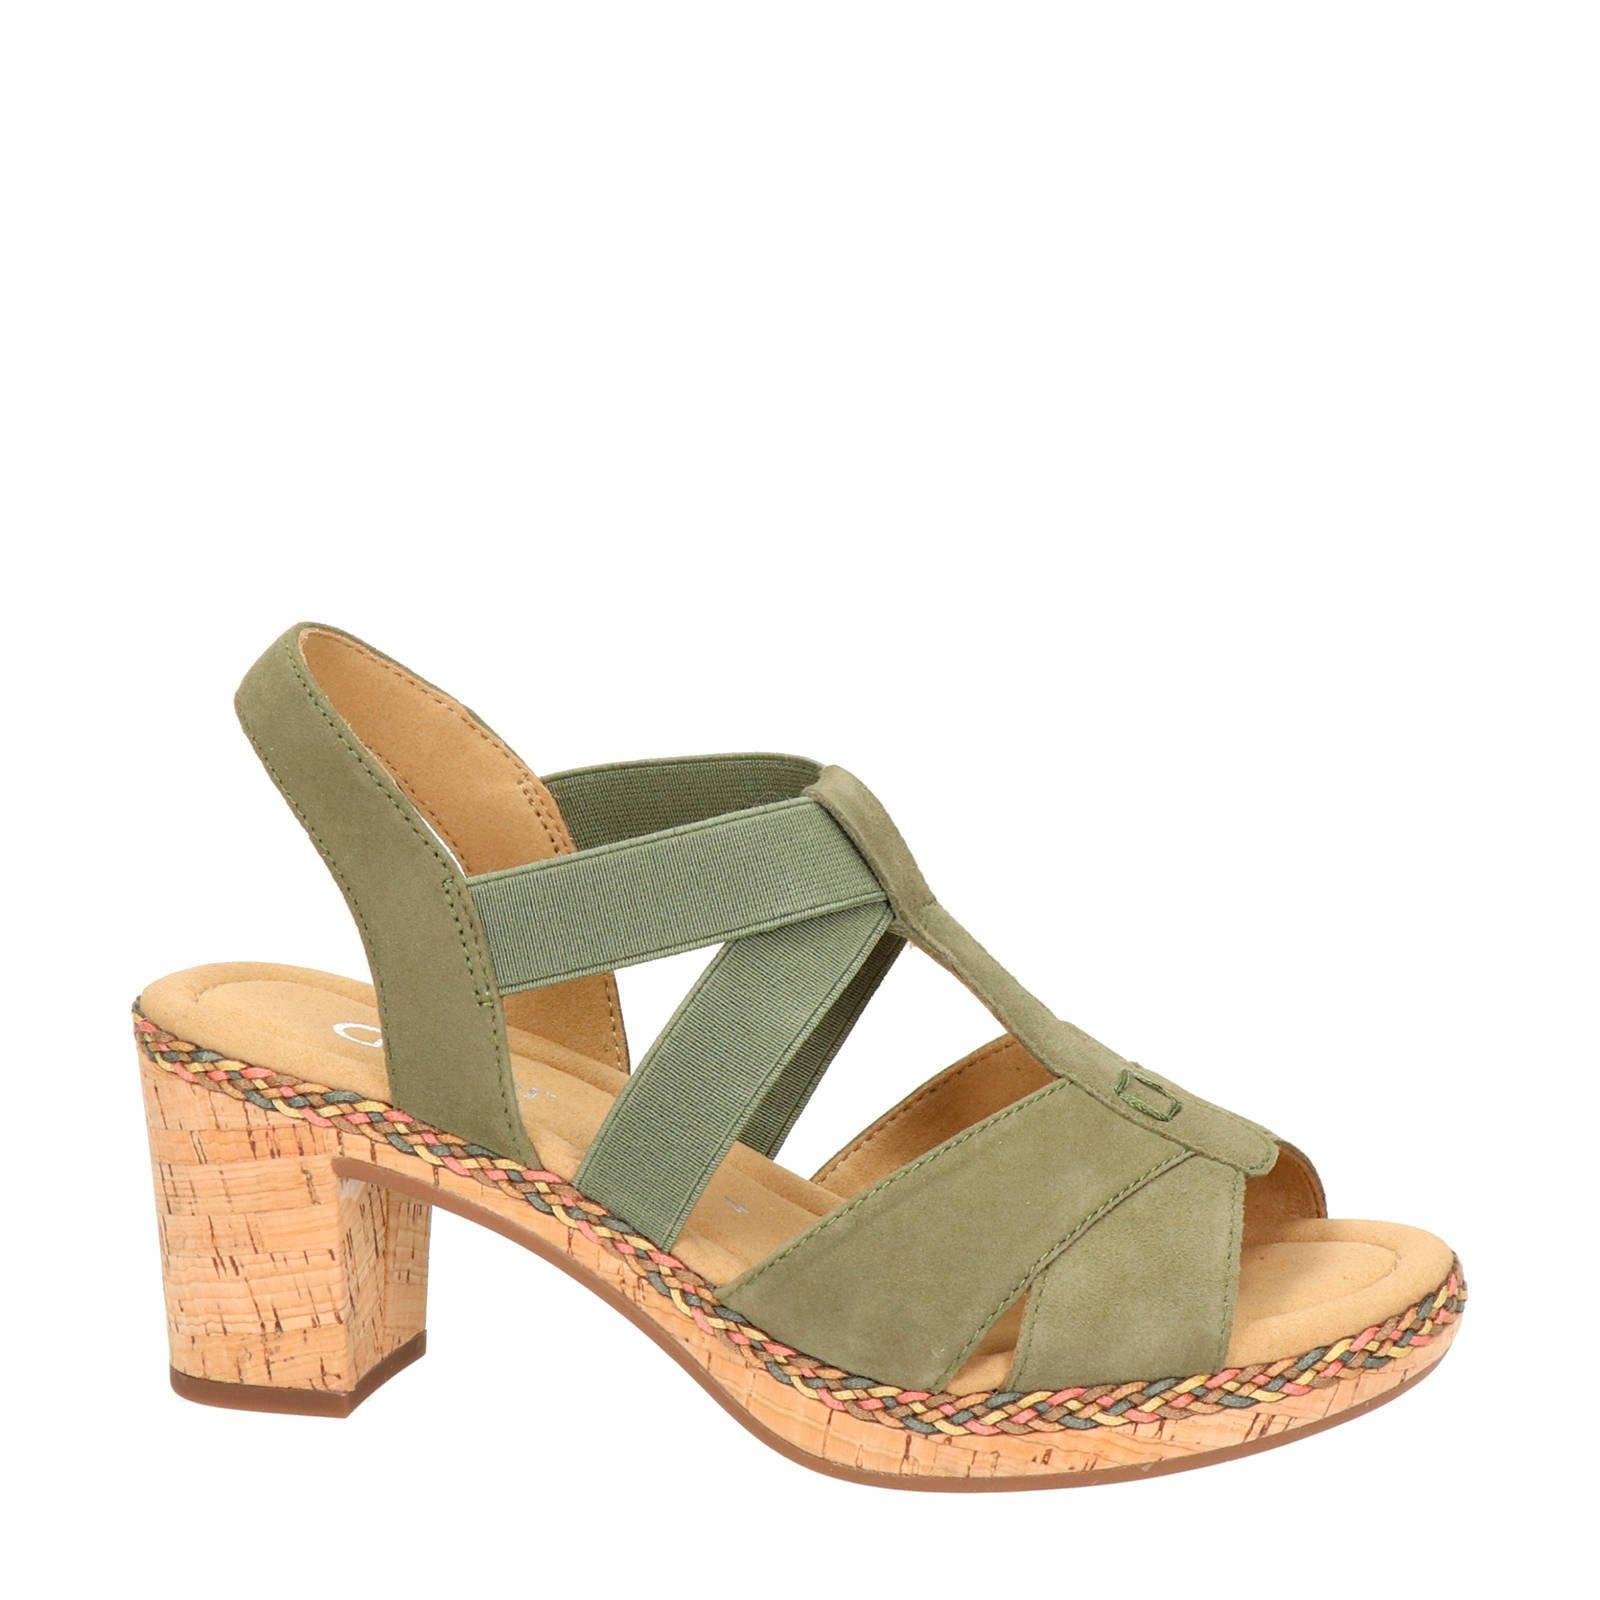 Sandalettes Suède Gabor Gabor Suède GroenWehkamp WYe2DHI9E